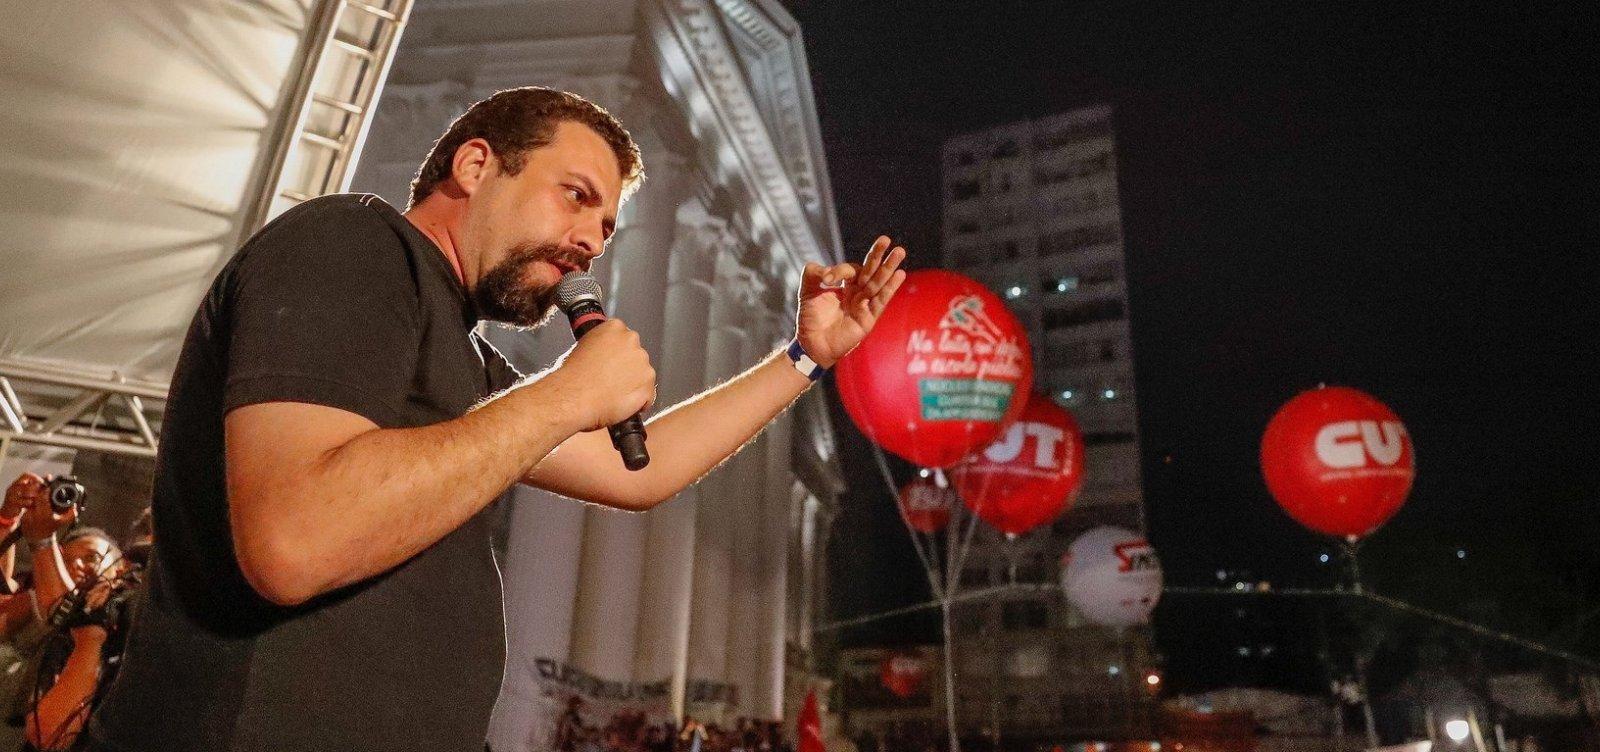 [Revista Time elege Guilherme Boulos e Anitta entre os 100 líderes do futuro]